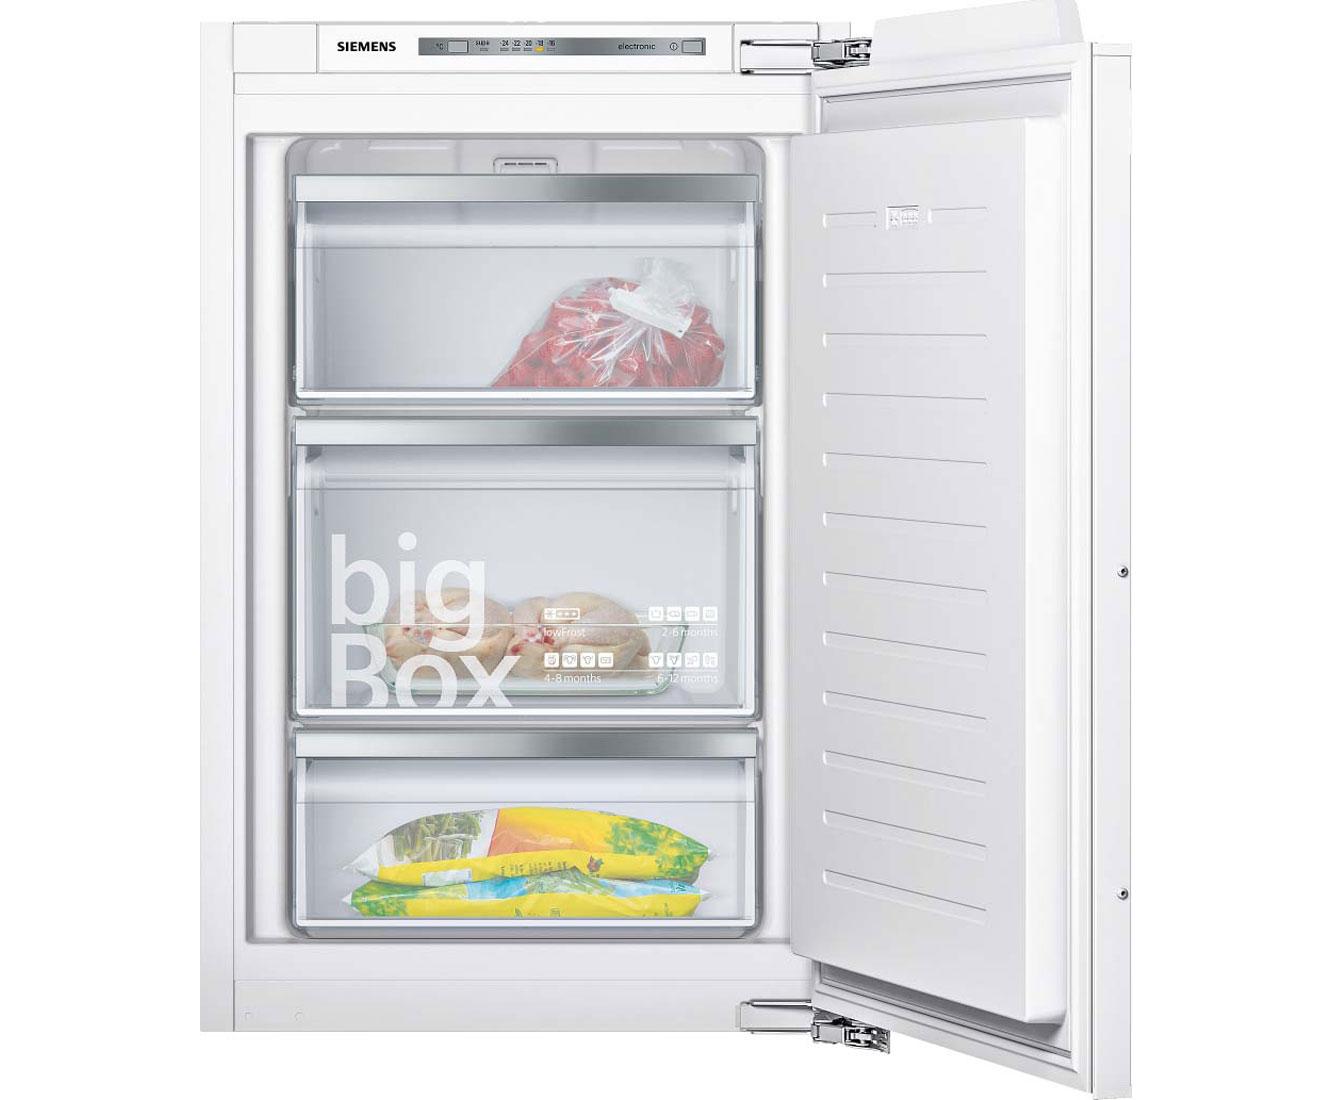 Bosch Kühlschrank Kgn 39 Xi 41 : Gefrierschrank media markt bosch kühlschrank kgn xi